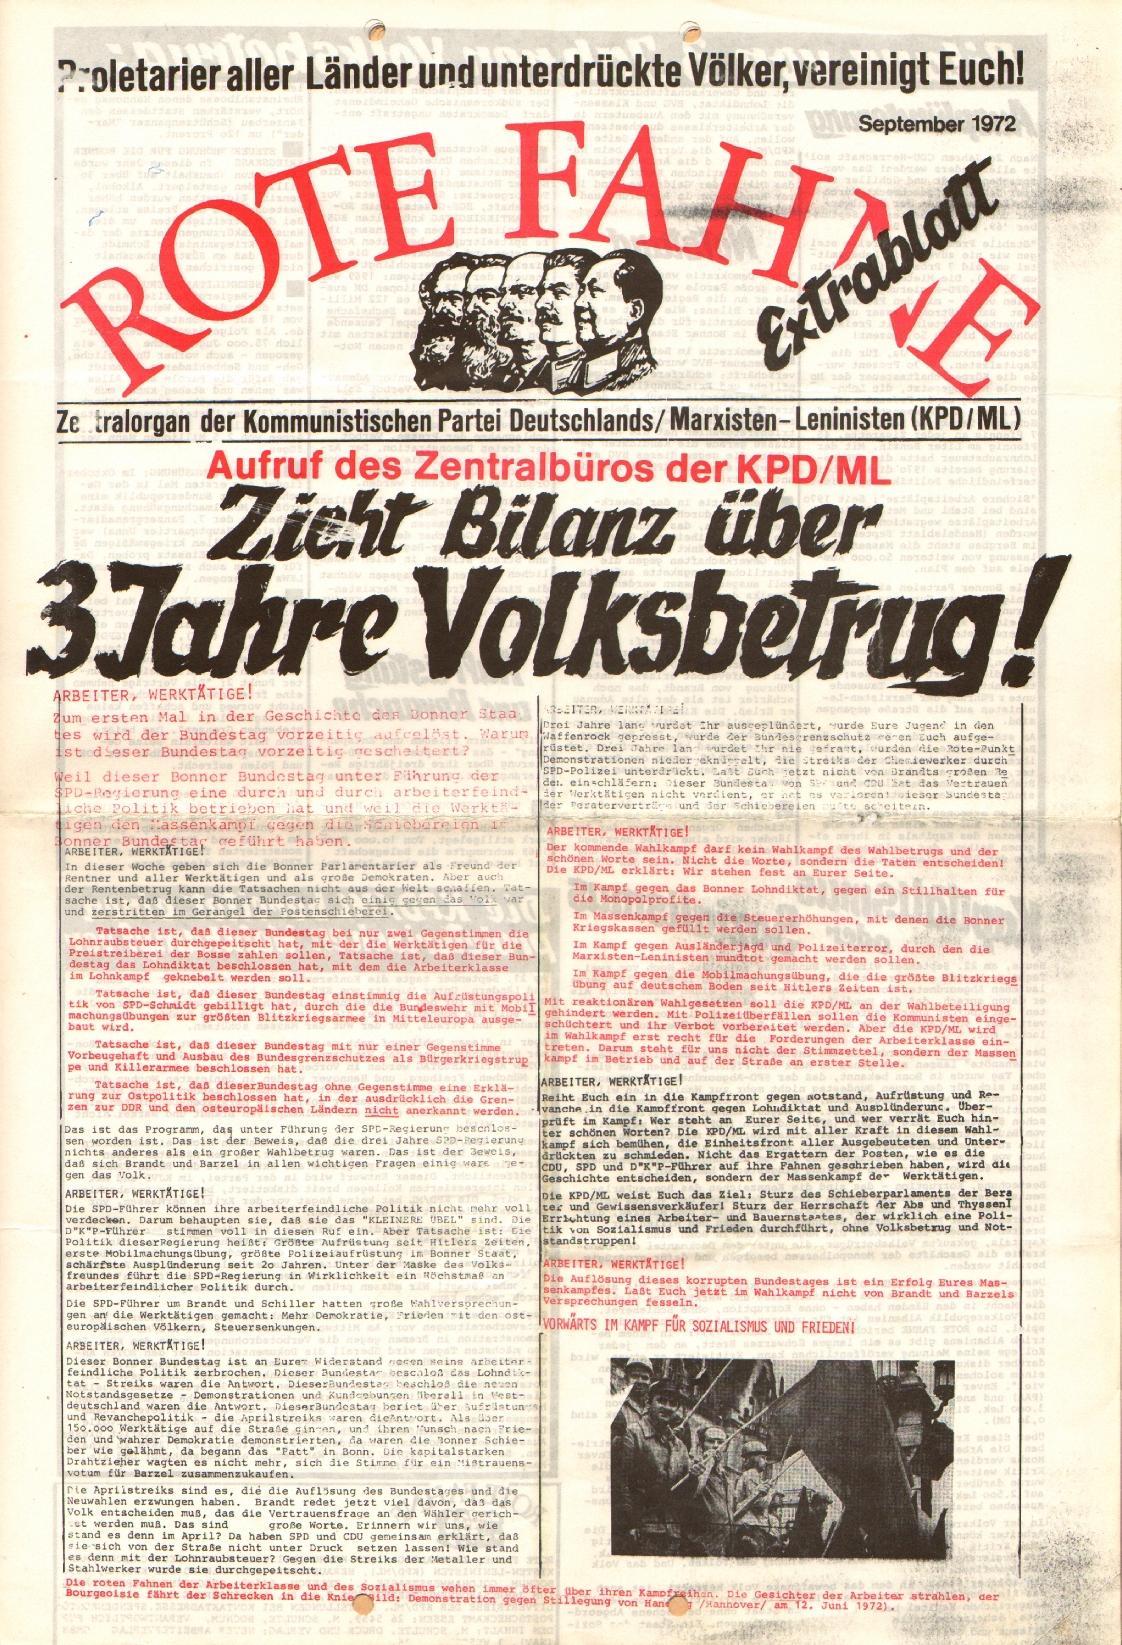 Rote Fahne, 3. Jg., September 1972, Extrablatt, Seite 1